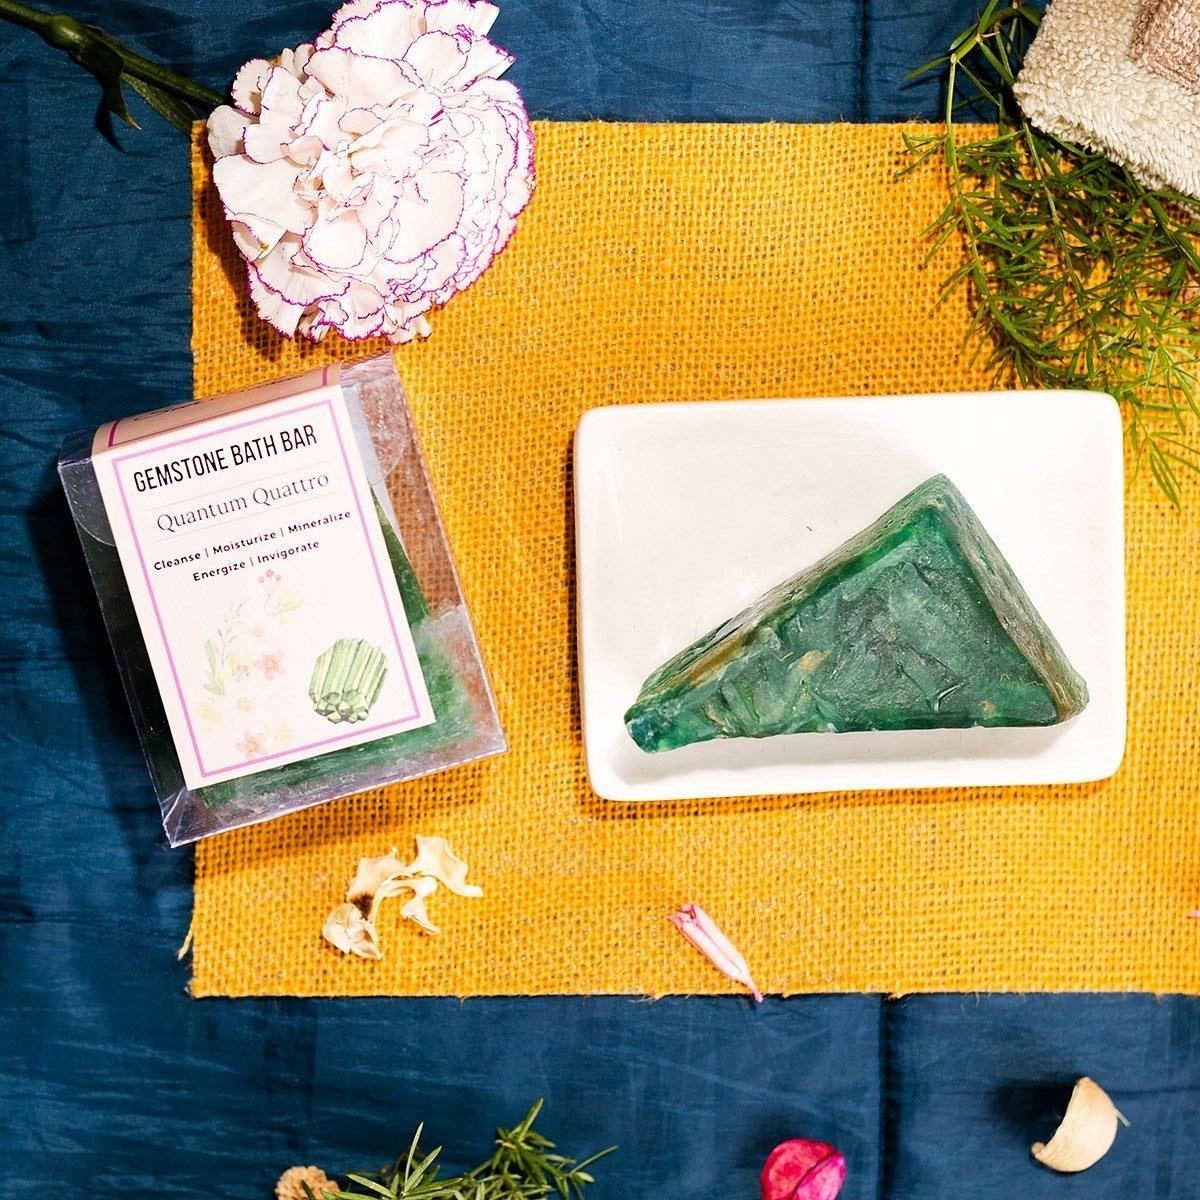 A gemstone soap bar next to a yellow cloth